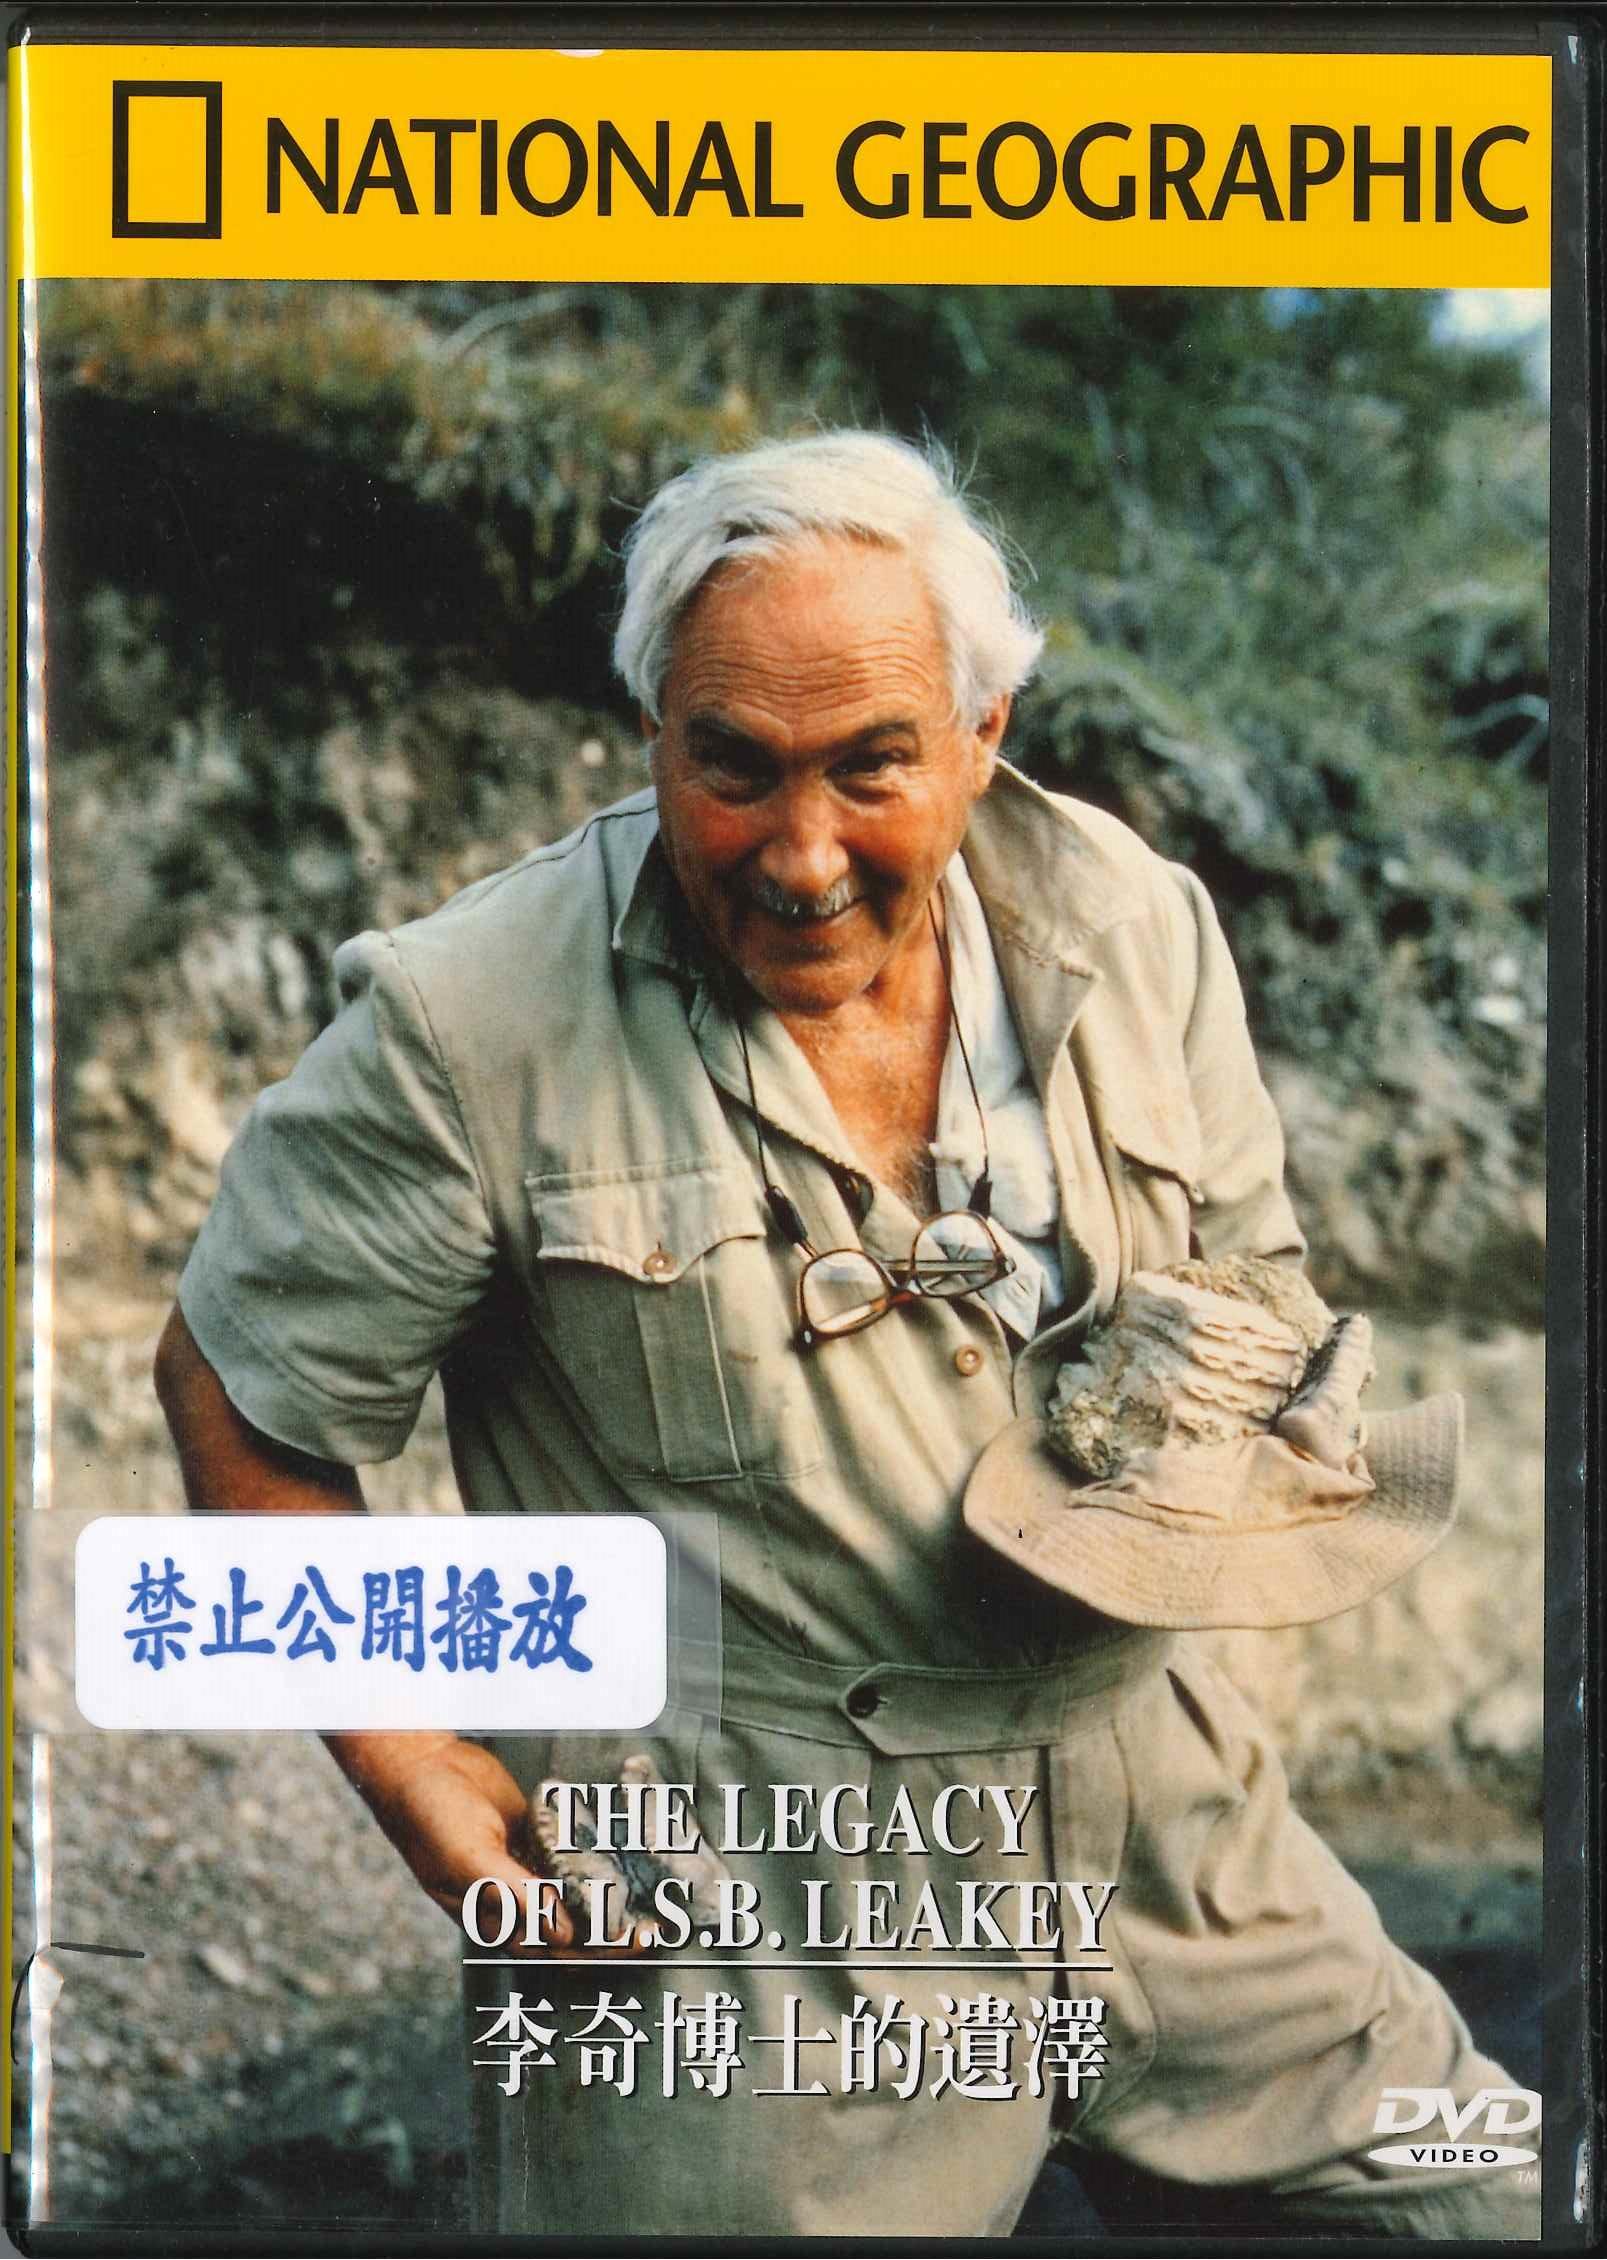 李奇博士的遺澤 [錄影資料]=The legacy of L.S.B. Leakey